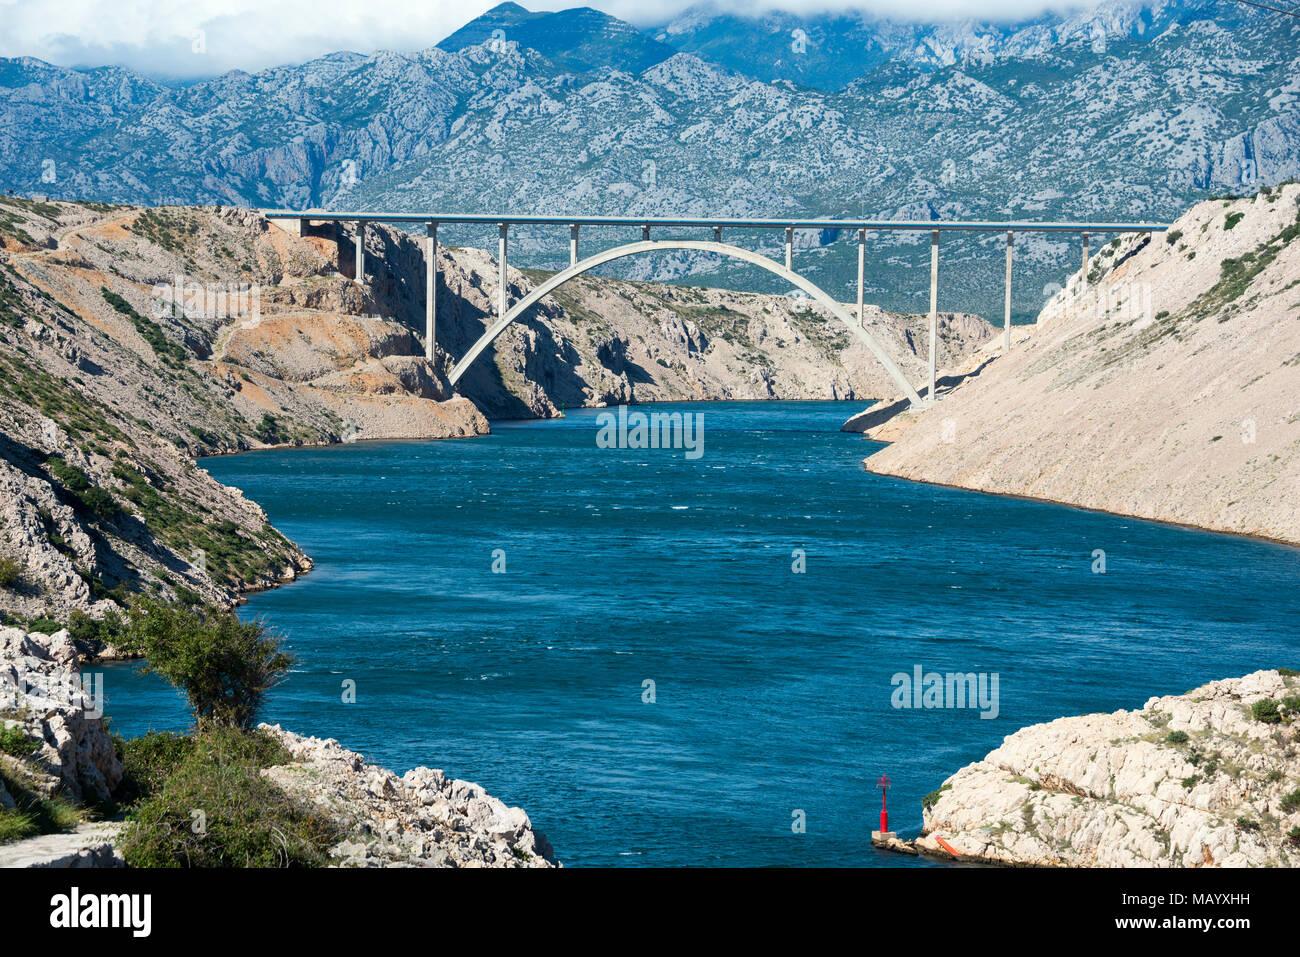 Paski Most Bridge, Pag Bridge, Pag Island, Dalmatia, Croatia - Stock Image